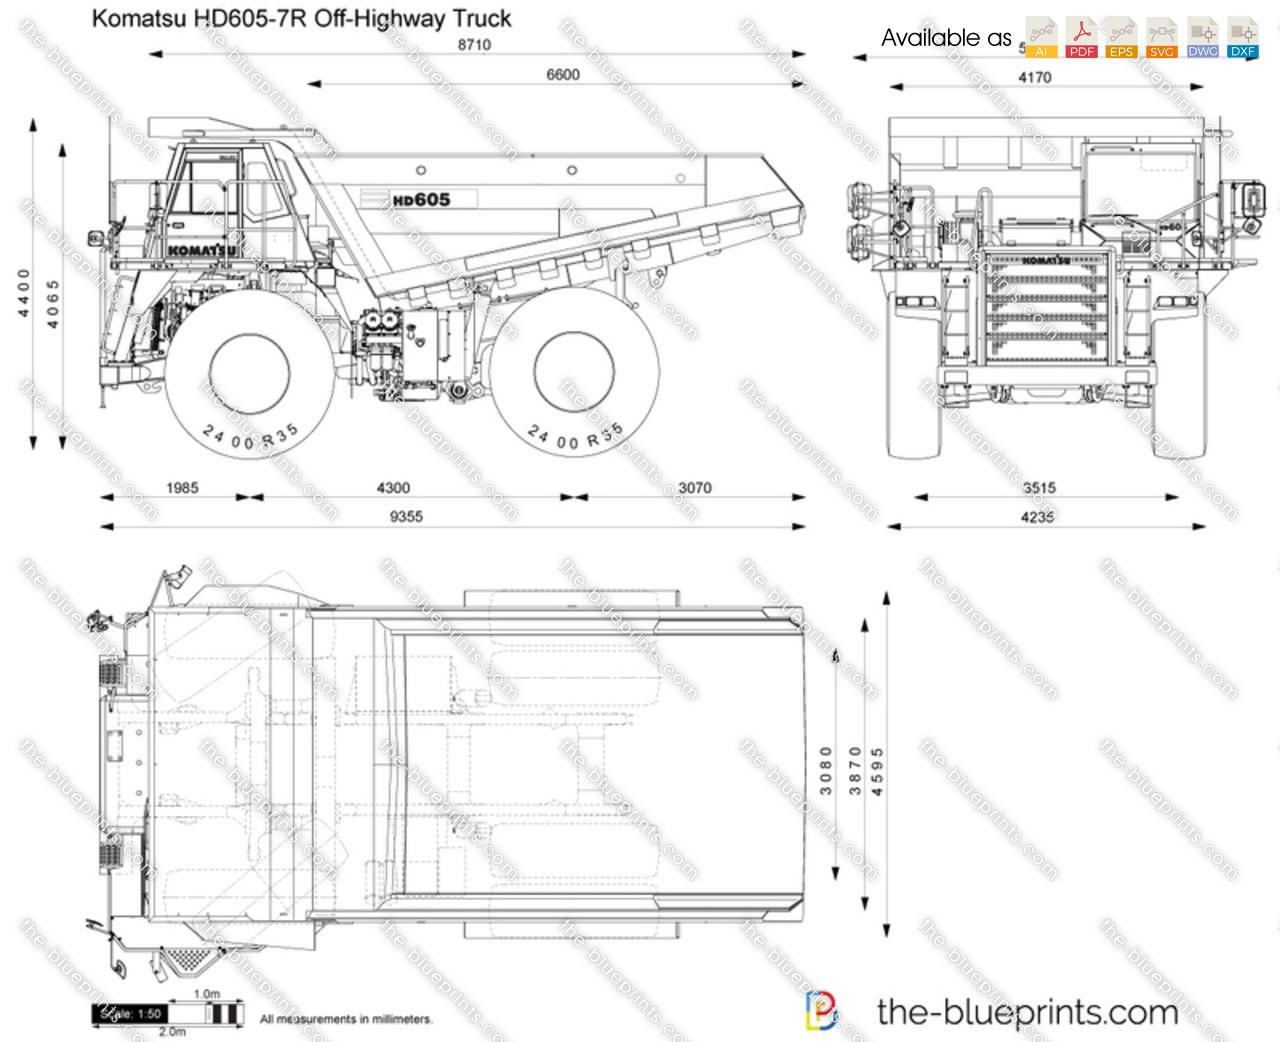 Komatsu HD605-7R Off-Highway Truck vector drawing